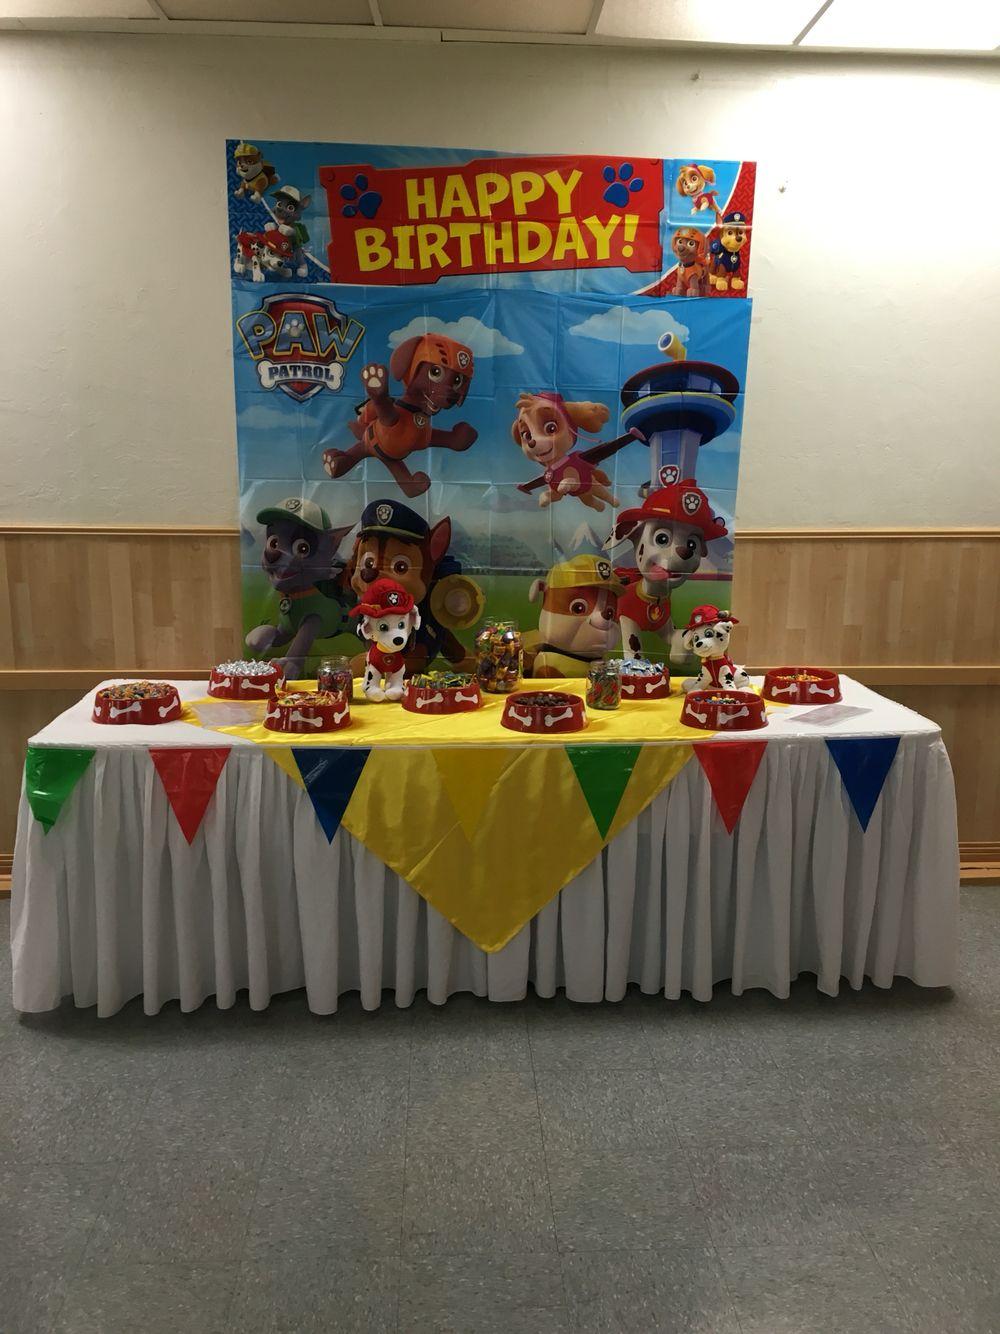 Paw Patrol Candy Table Paw Patrol Birthday Theme Paw Patrol Birthday Party Paw Patrol Birthday